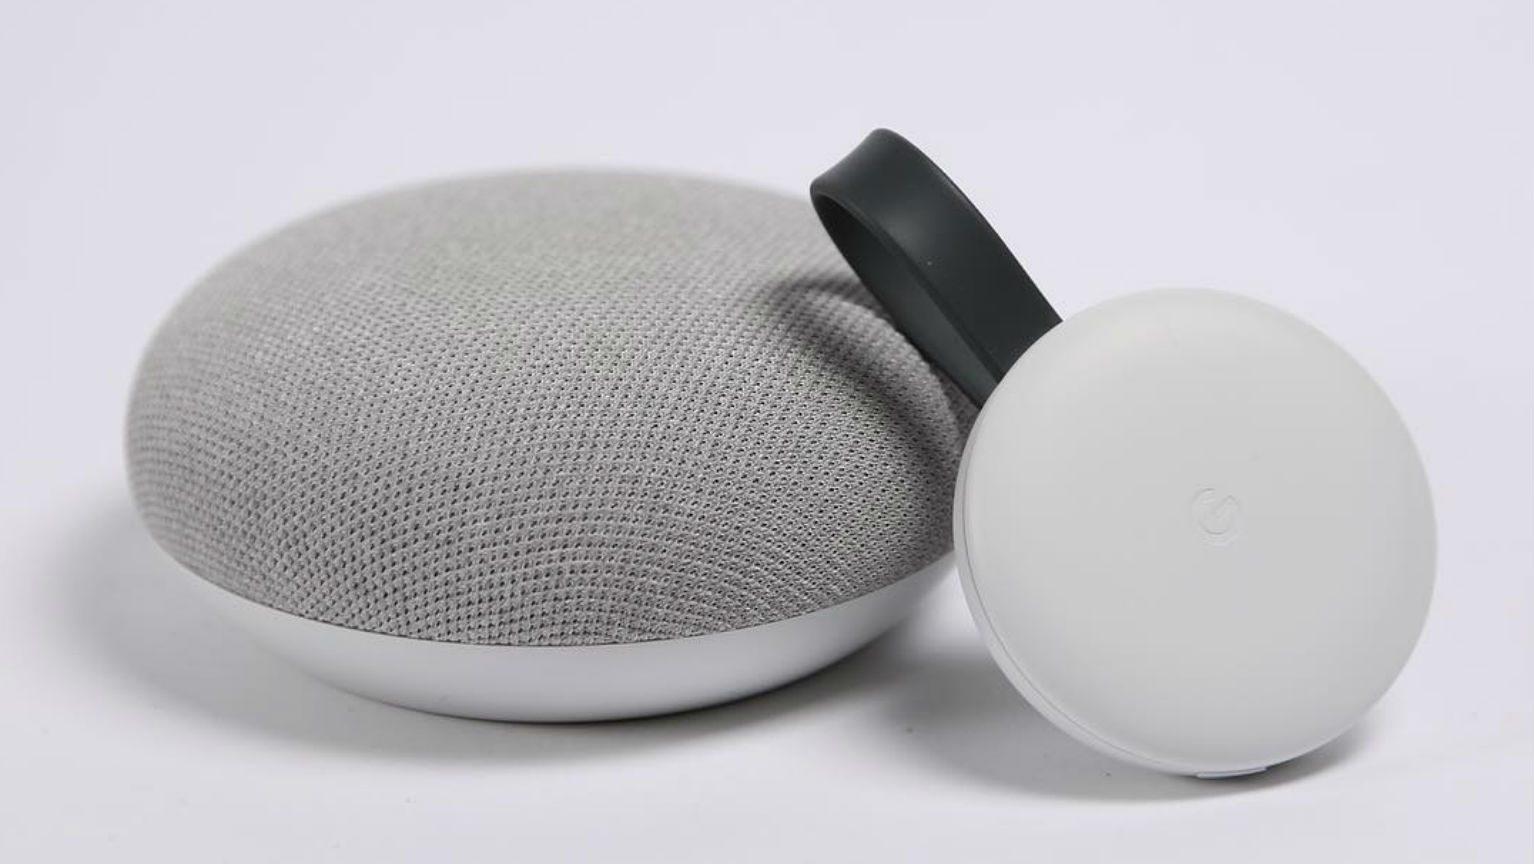 Google Home mini and chromecast